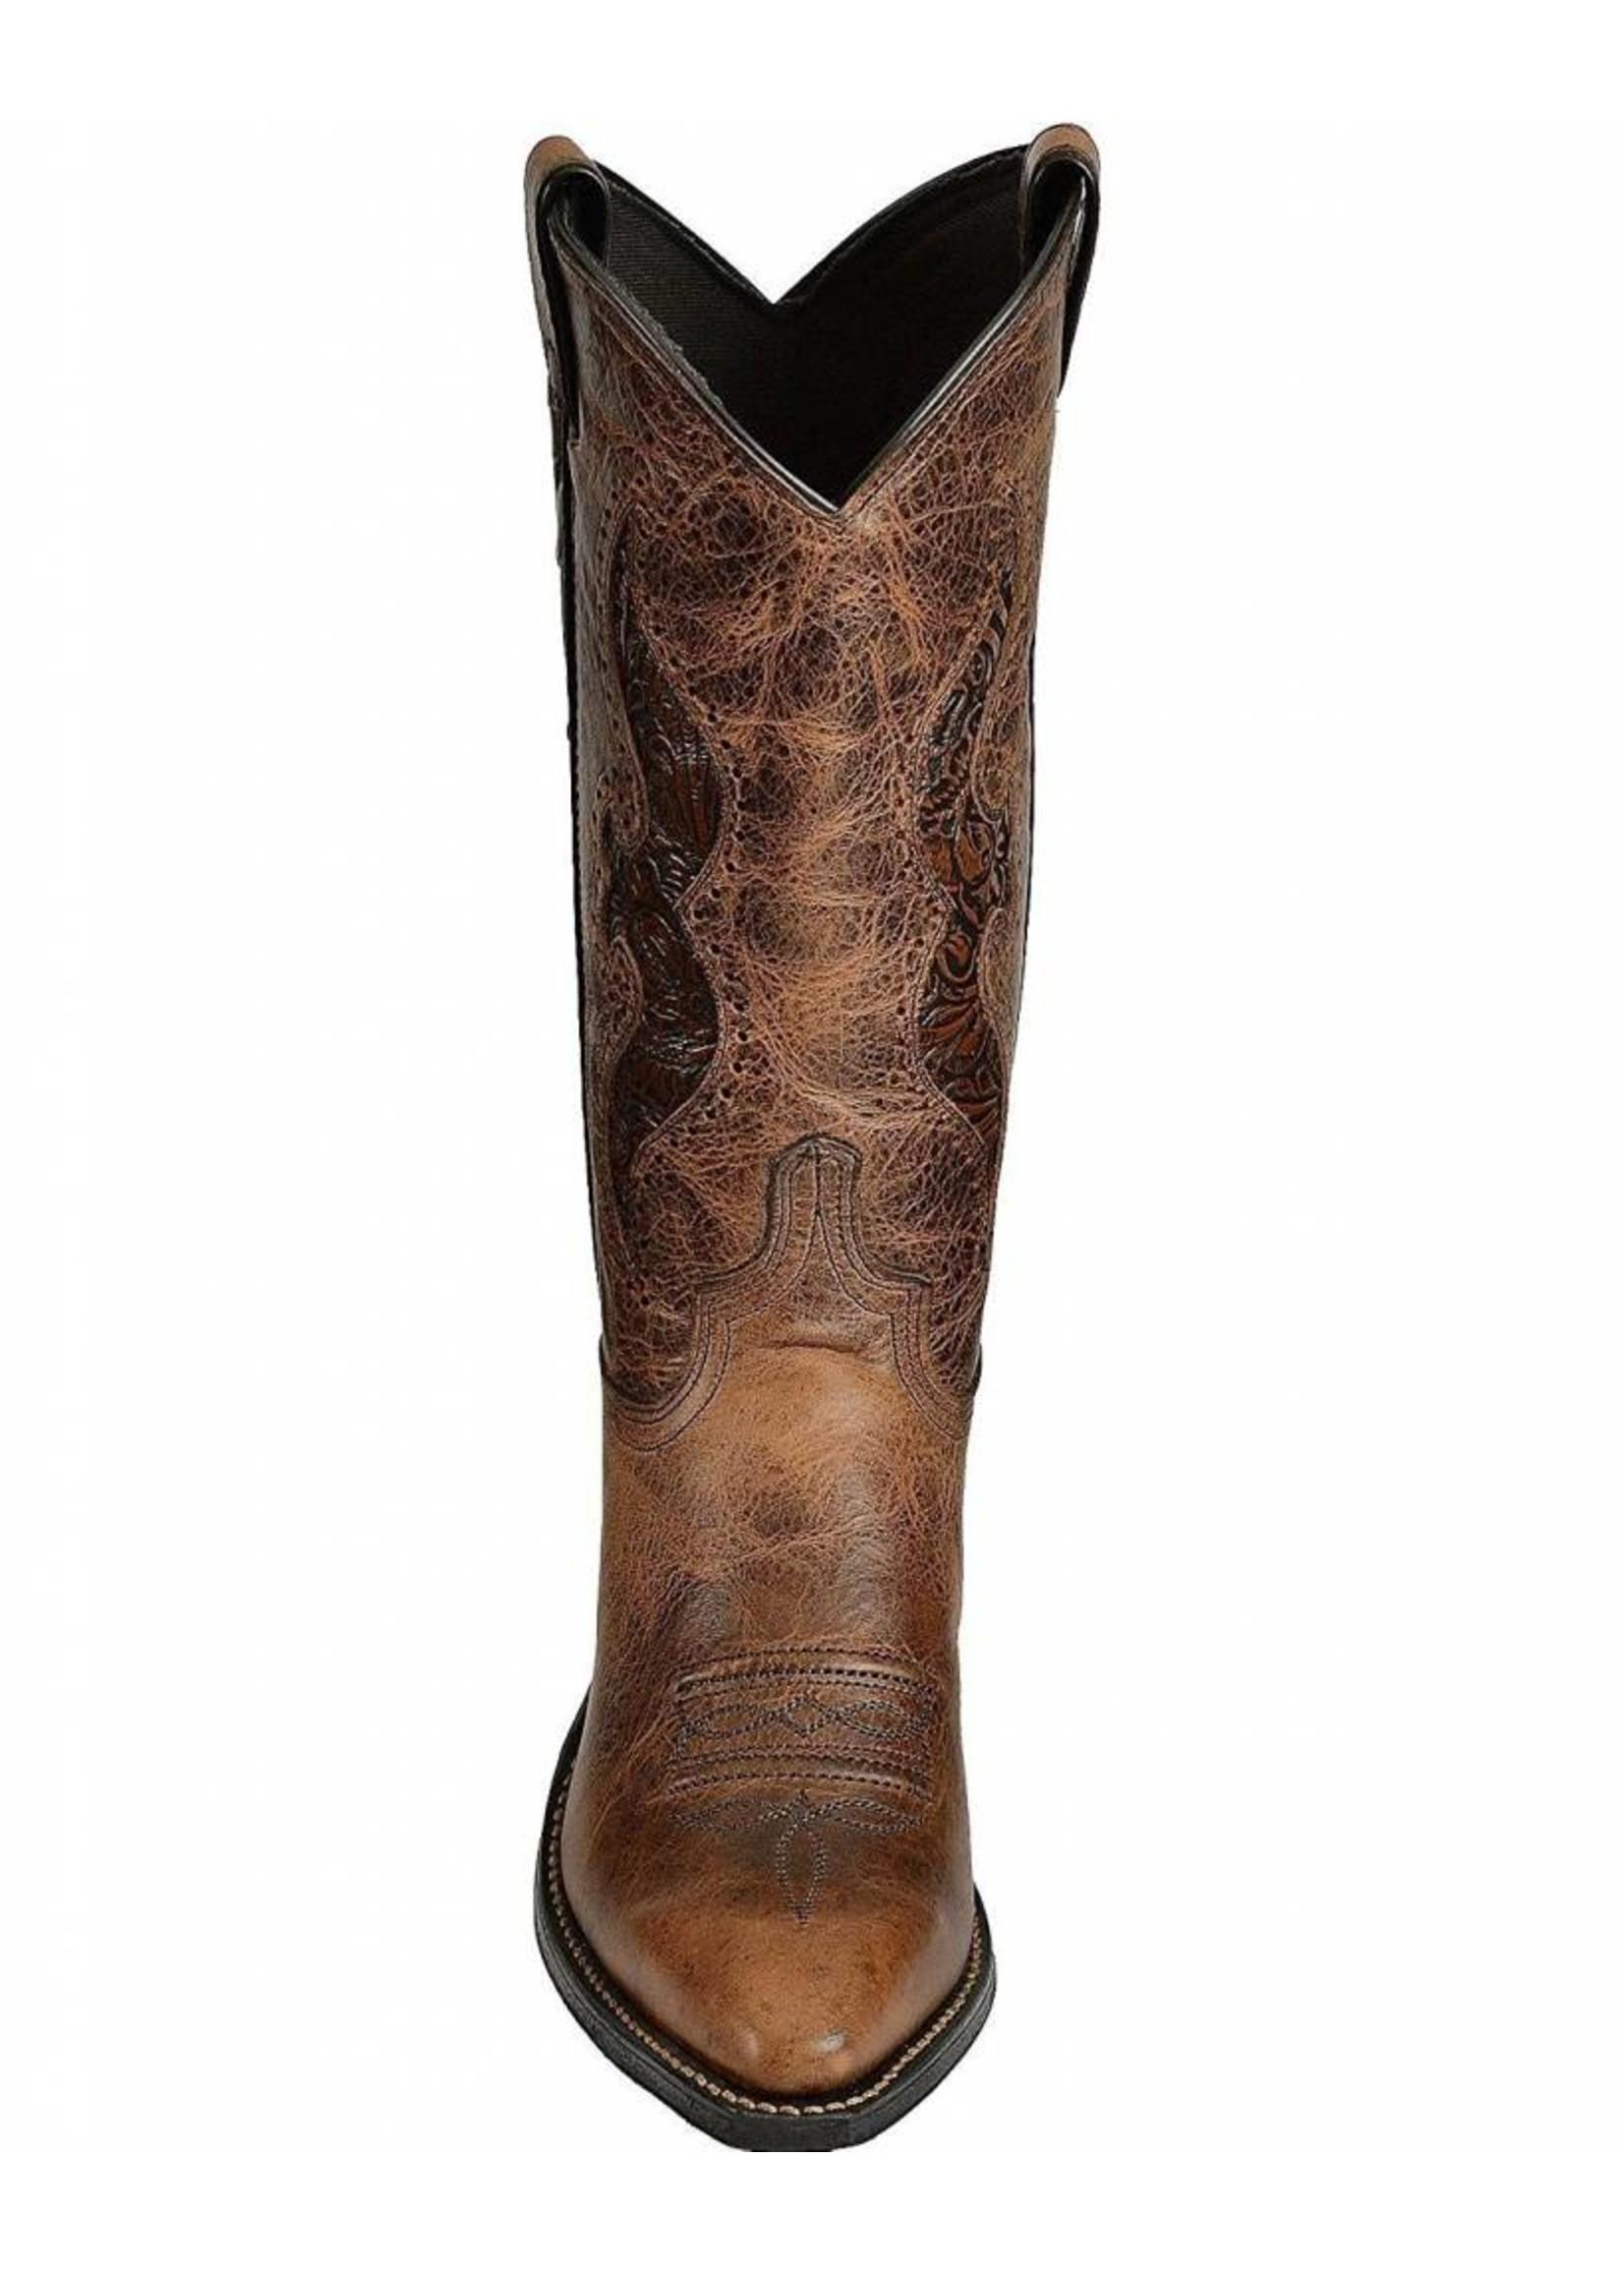 Abilene Women's Hand Tooled Inlay Cowgirl Boot Snip Toe - 9141